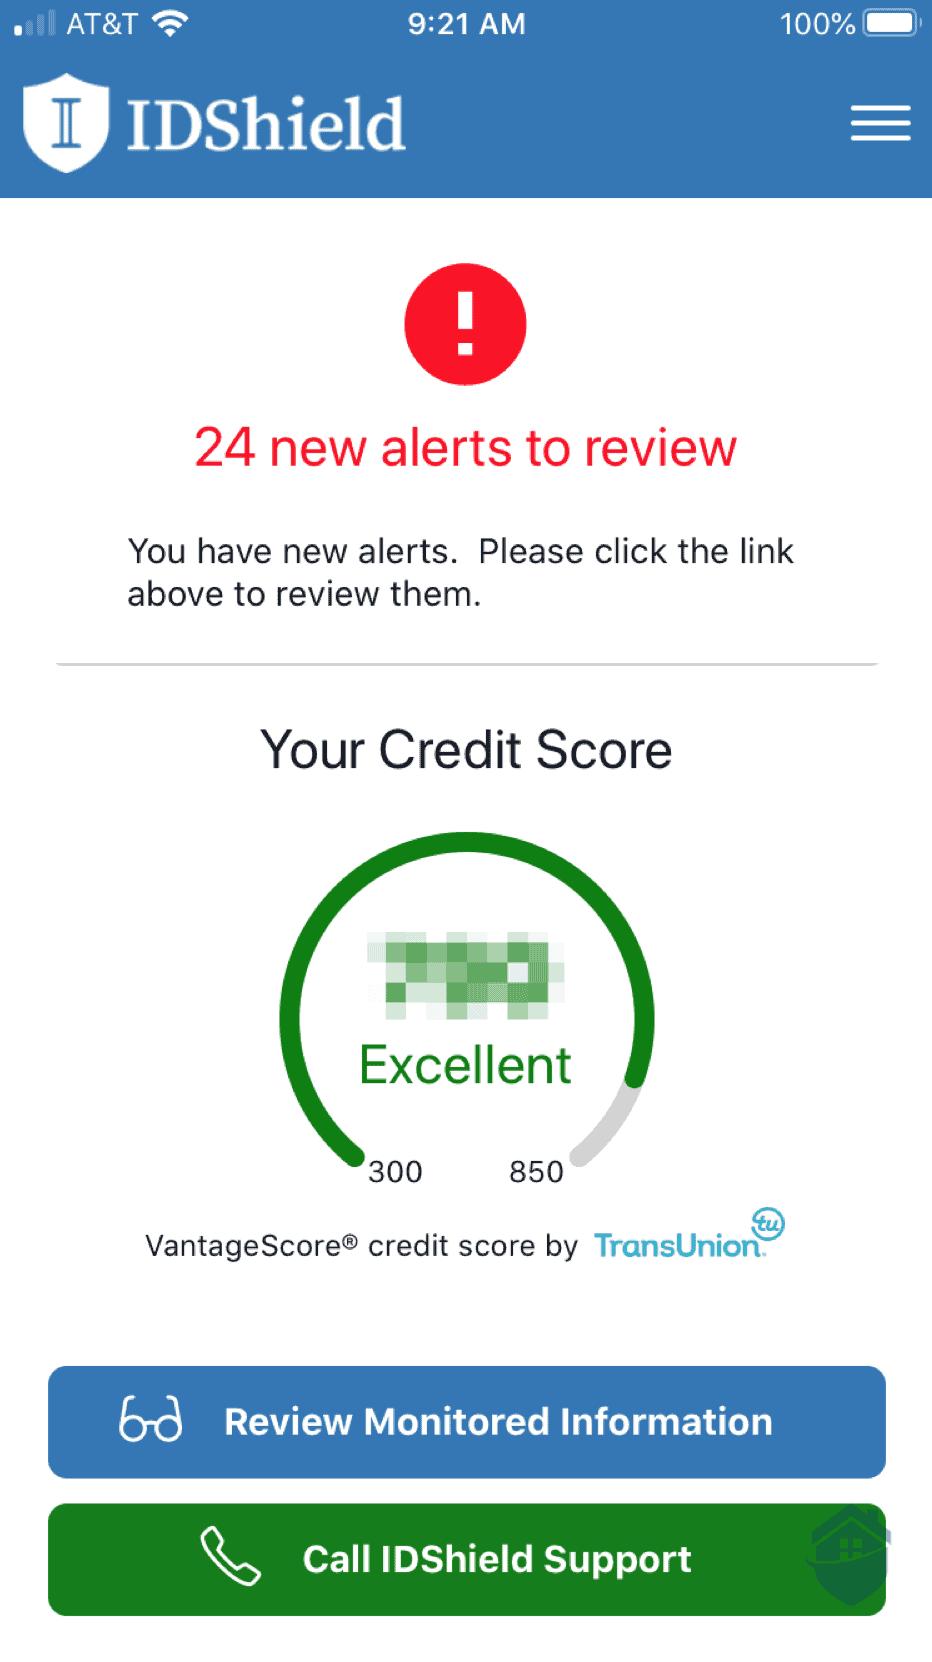 IDShield Credit Score